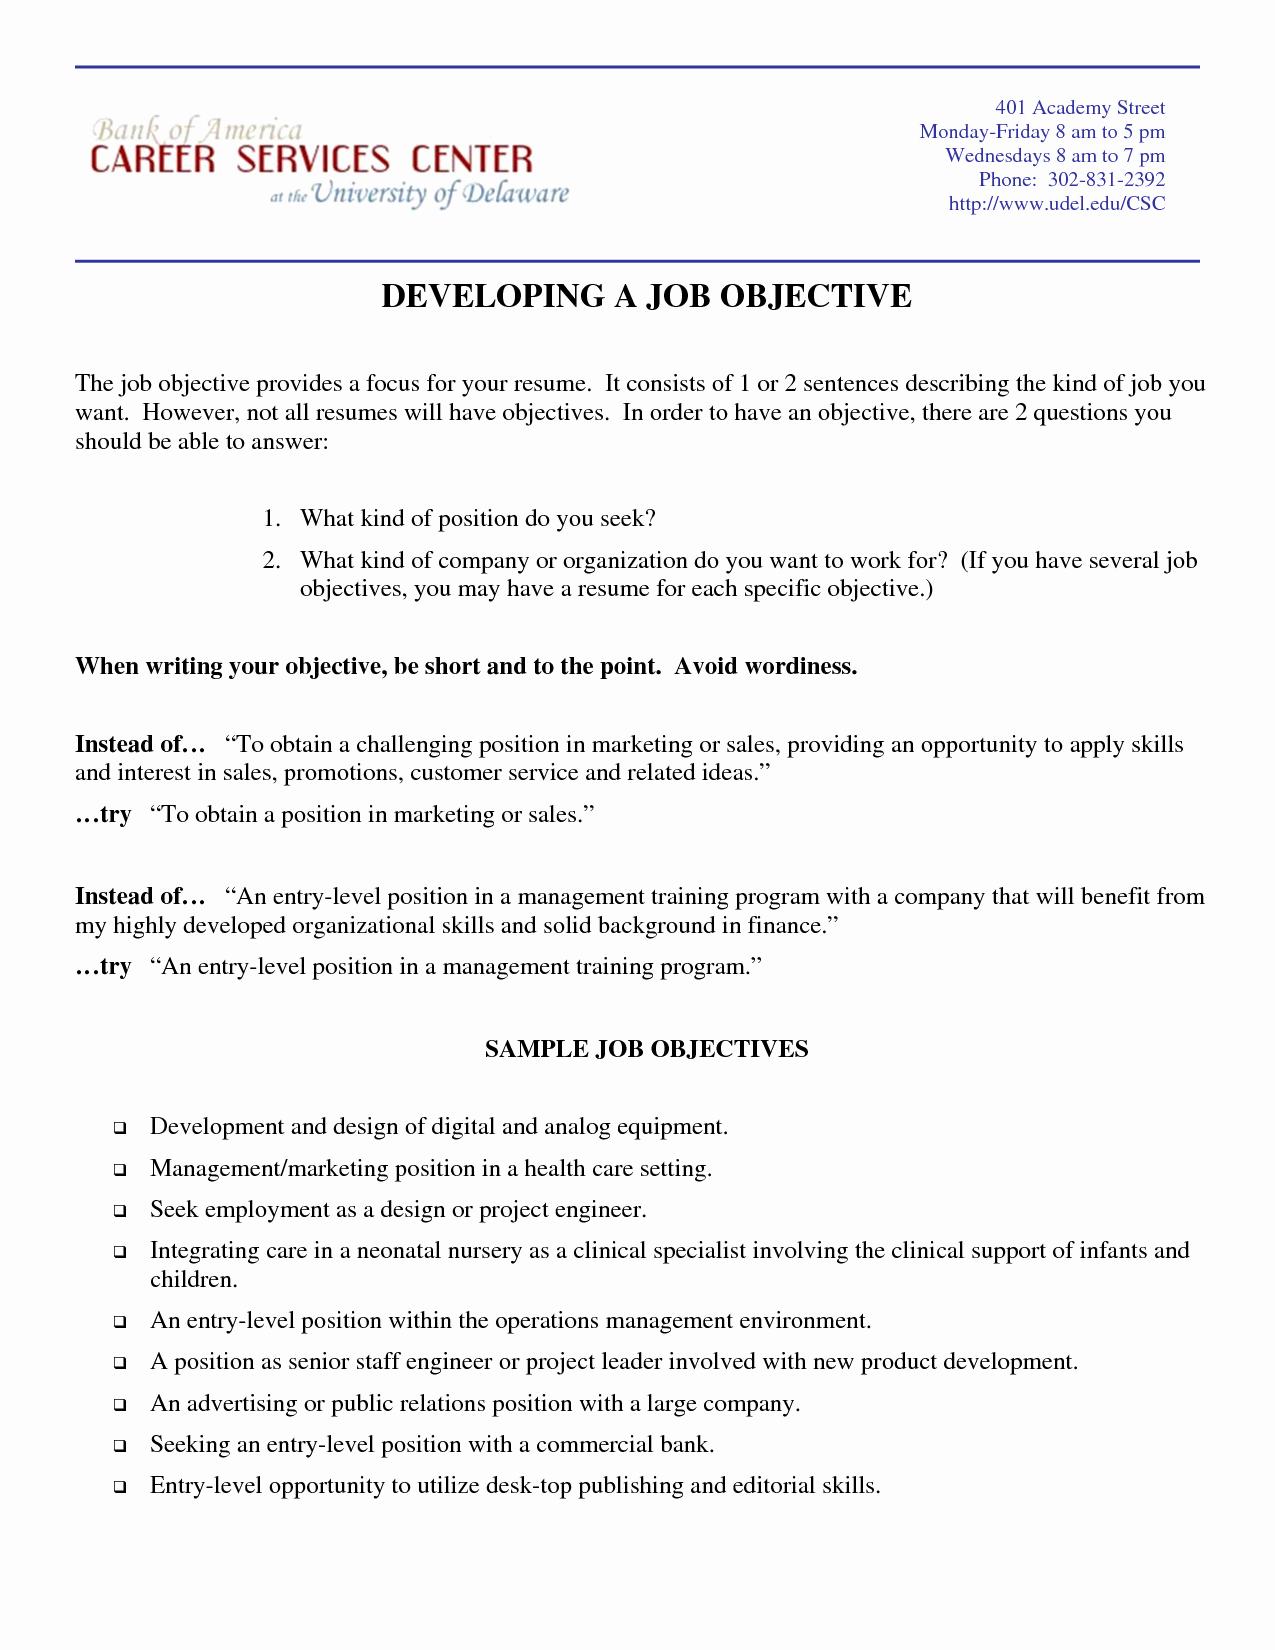 Marketing Resume Objective Samples